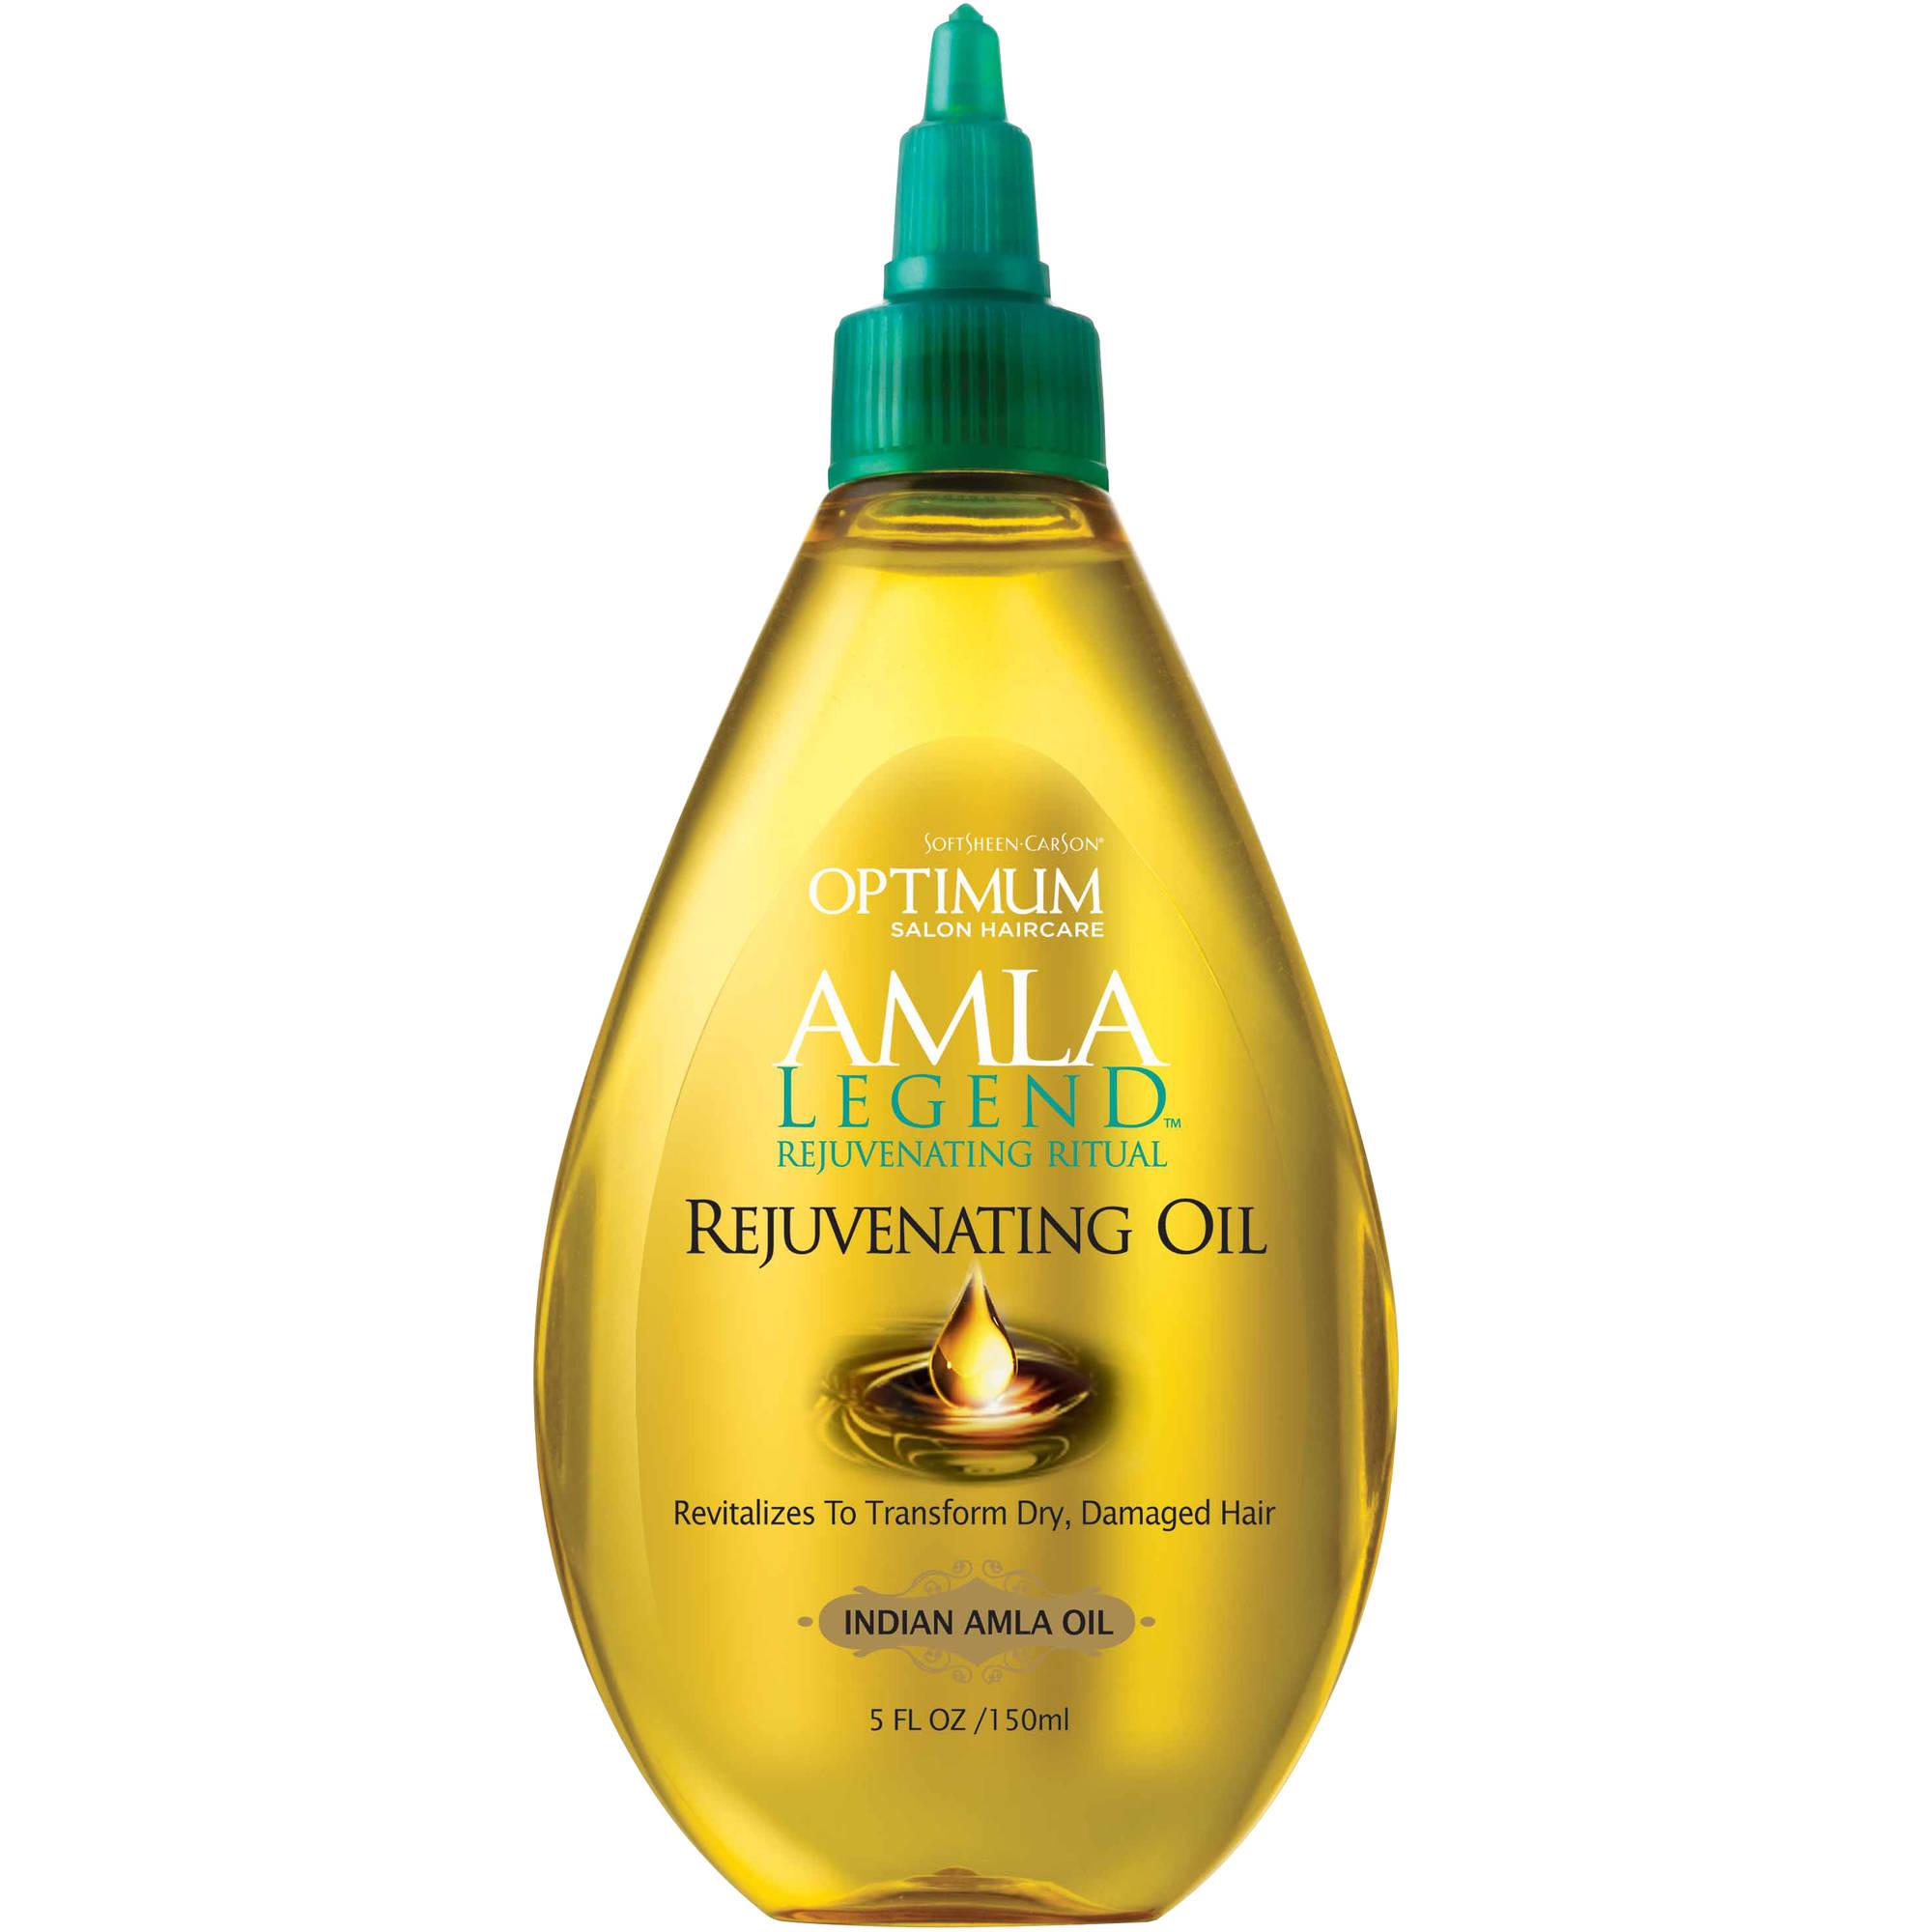 Optimum Salon Haircare AMLA Legend Rejuvenating Oil, 5 fl oz